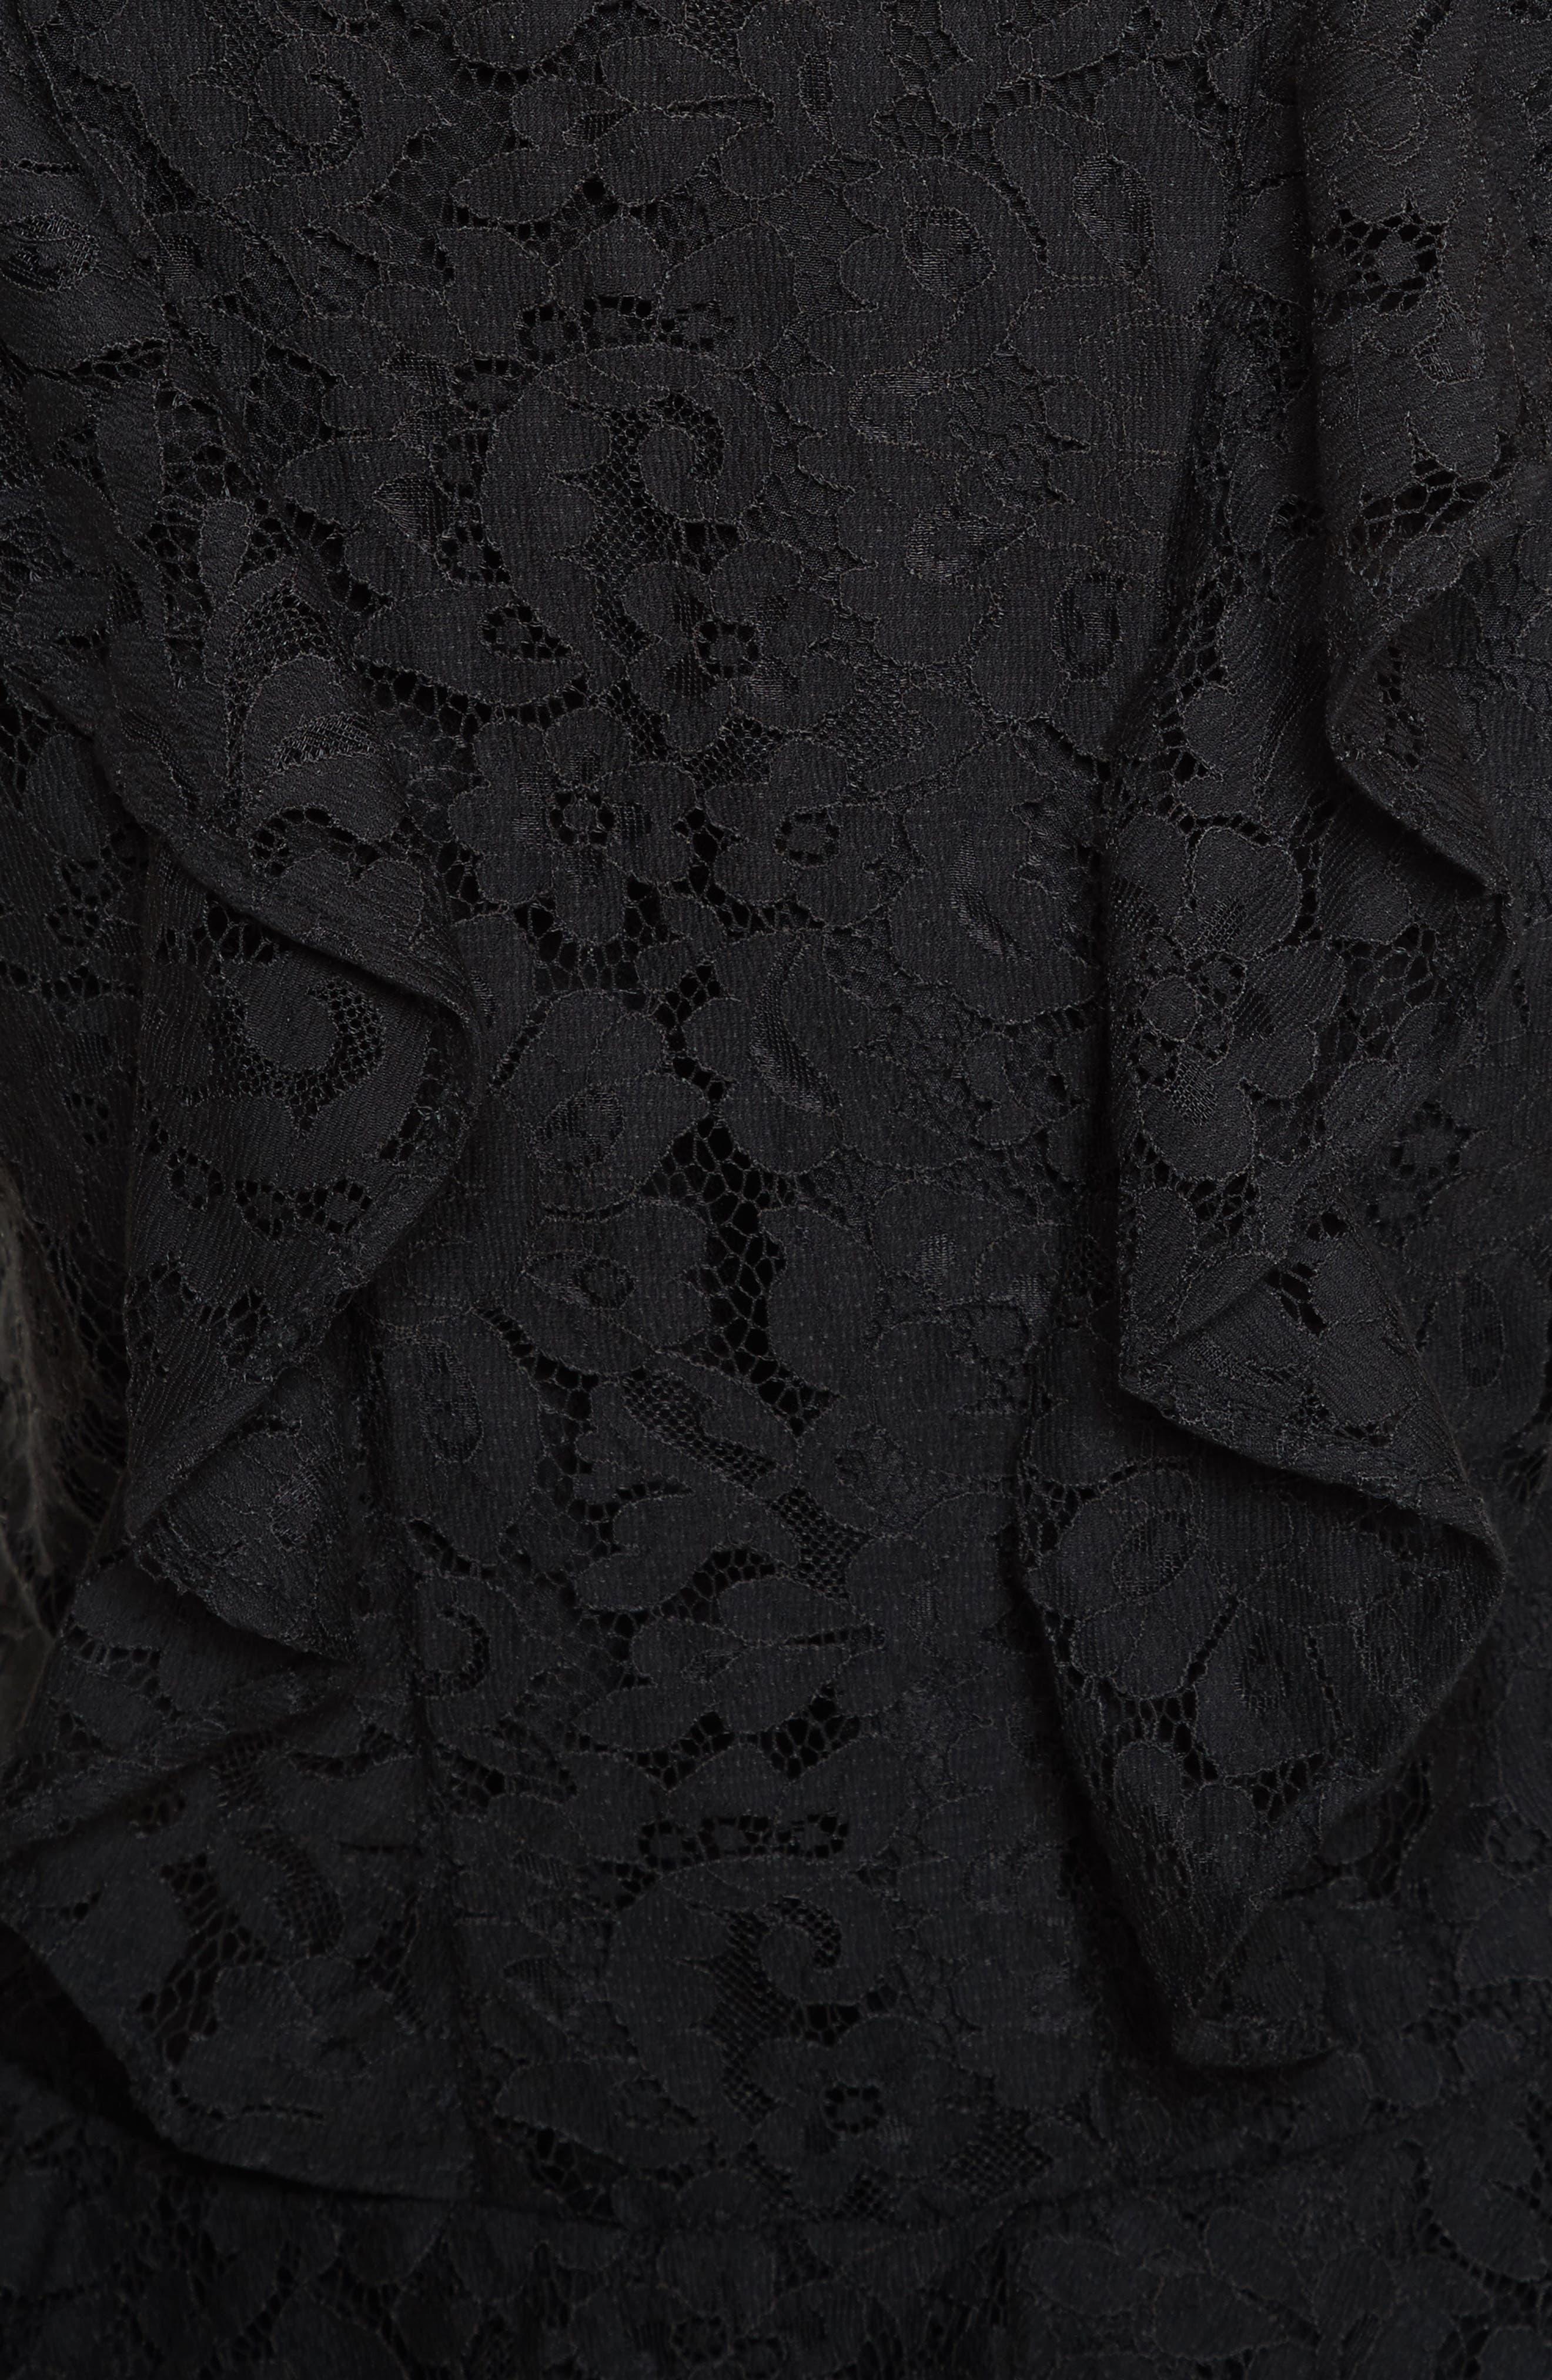 Acostas Ruffle & Lace Dress,                             Alternate thumbnail 5, color,                             002